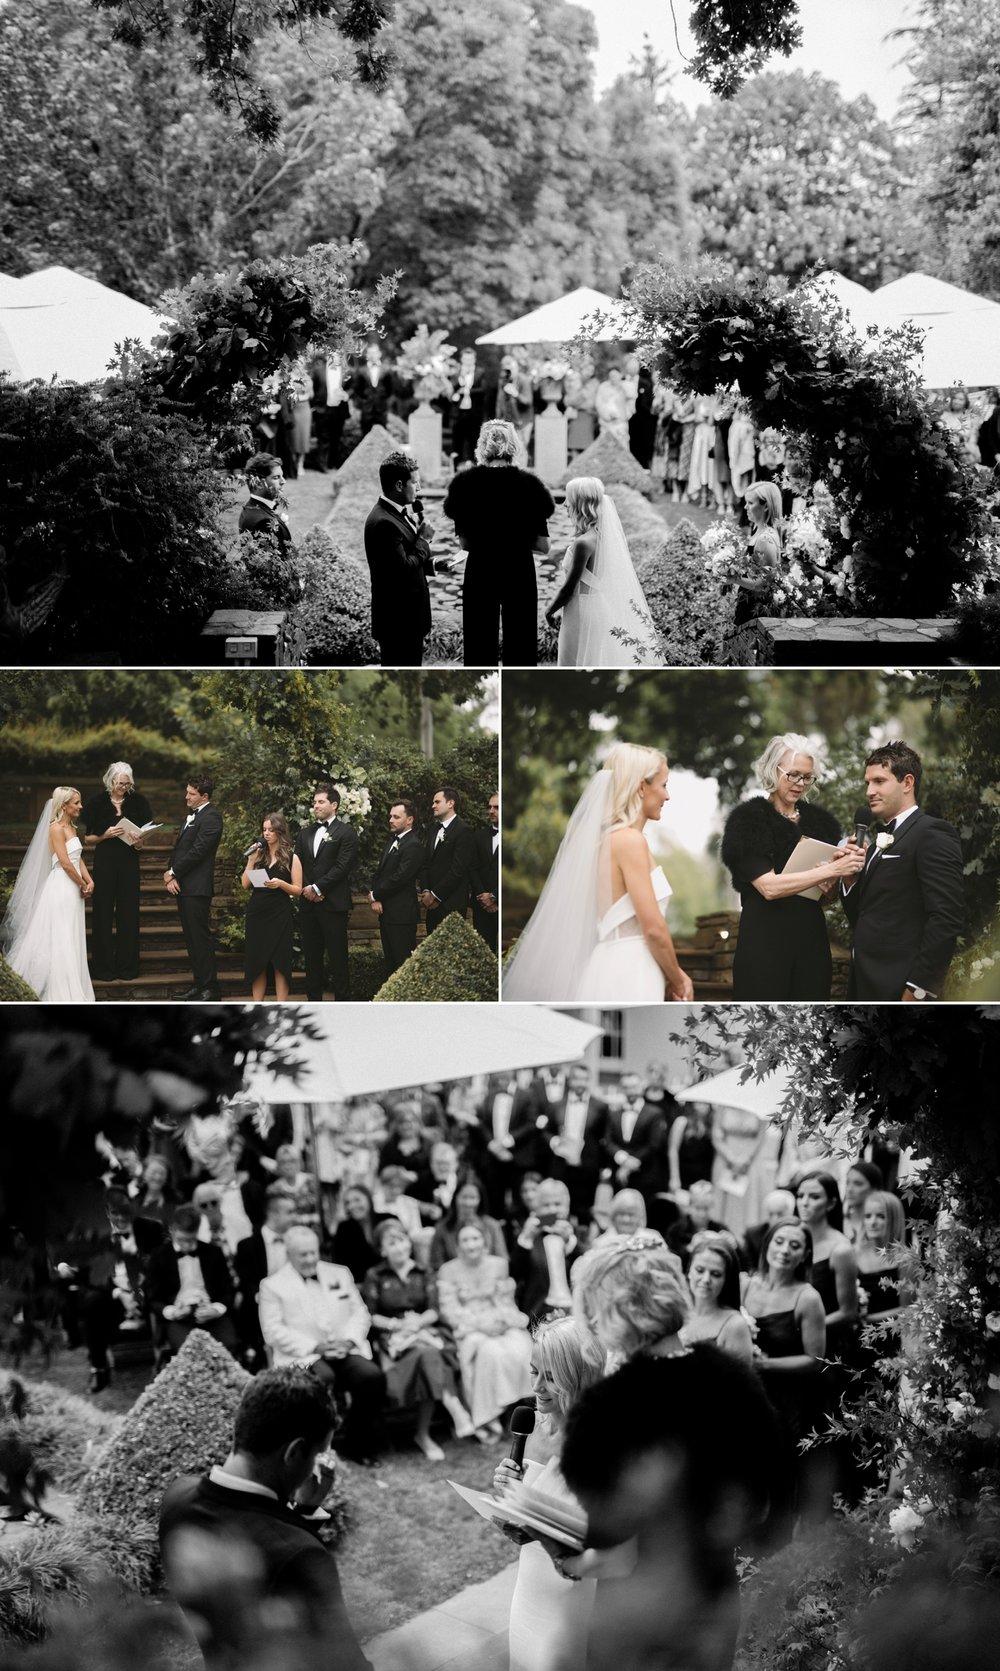 Rebecca & Daniel - Adelaide Hills Private Property Wedding Photographer - Fine Art Wedding Photographer Australia - Katherine Schultz - www.katherineschultzphotography.com_0037.jpg